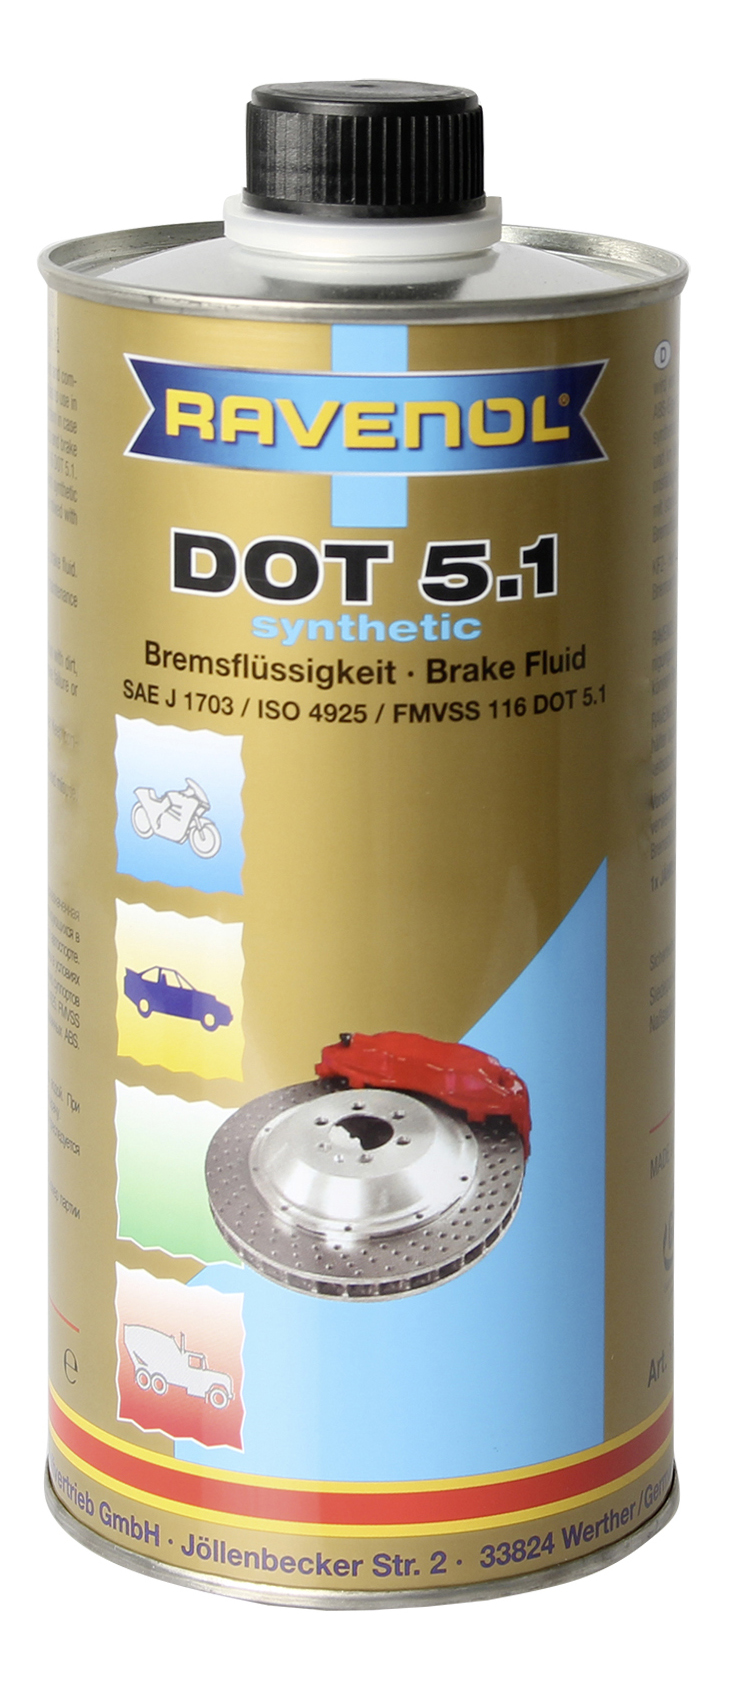 Тормозная жидкость RAVENOL DOT 5.1 1л 1350602-001-01-000 фото